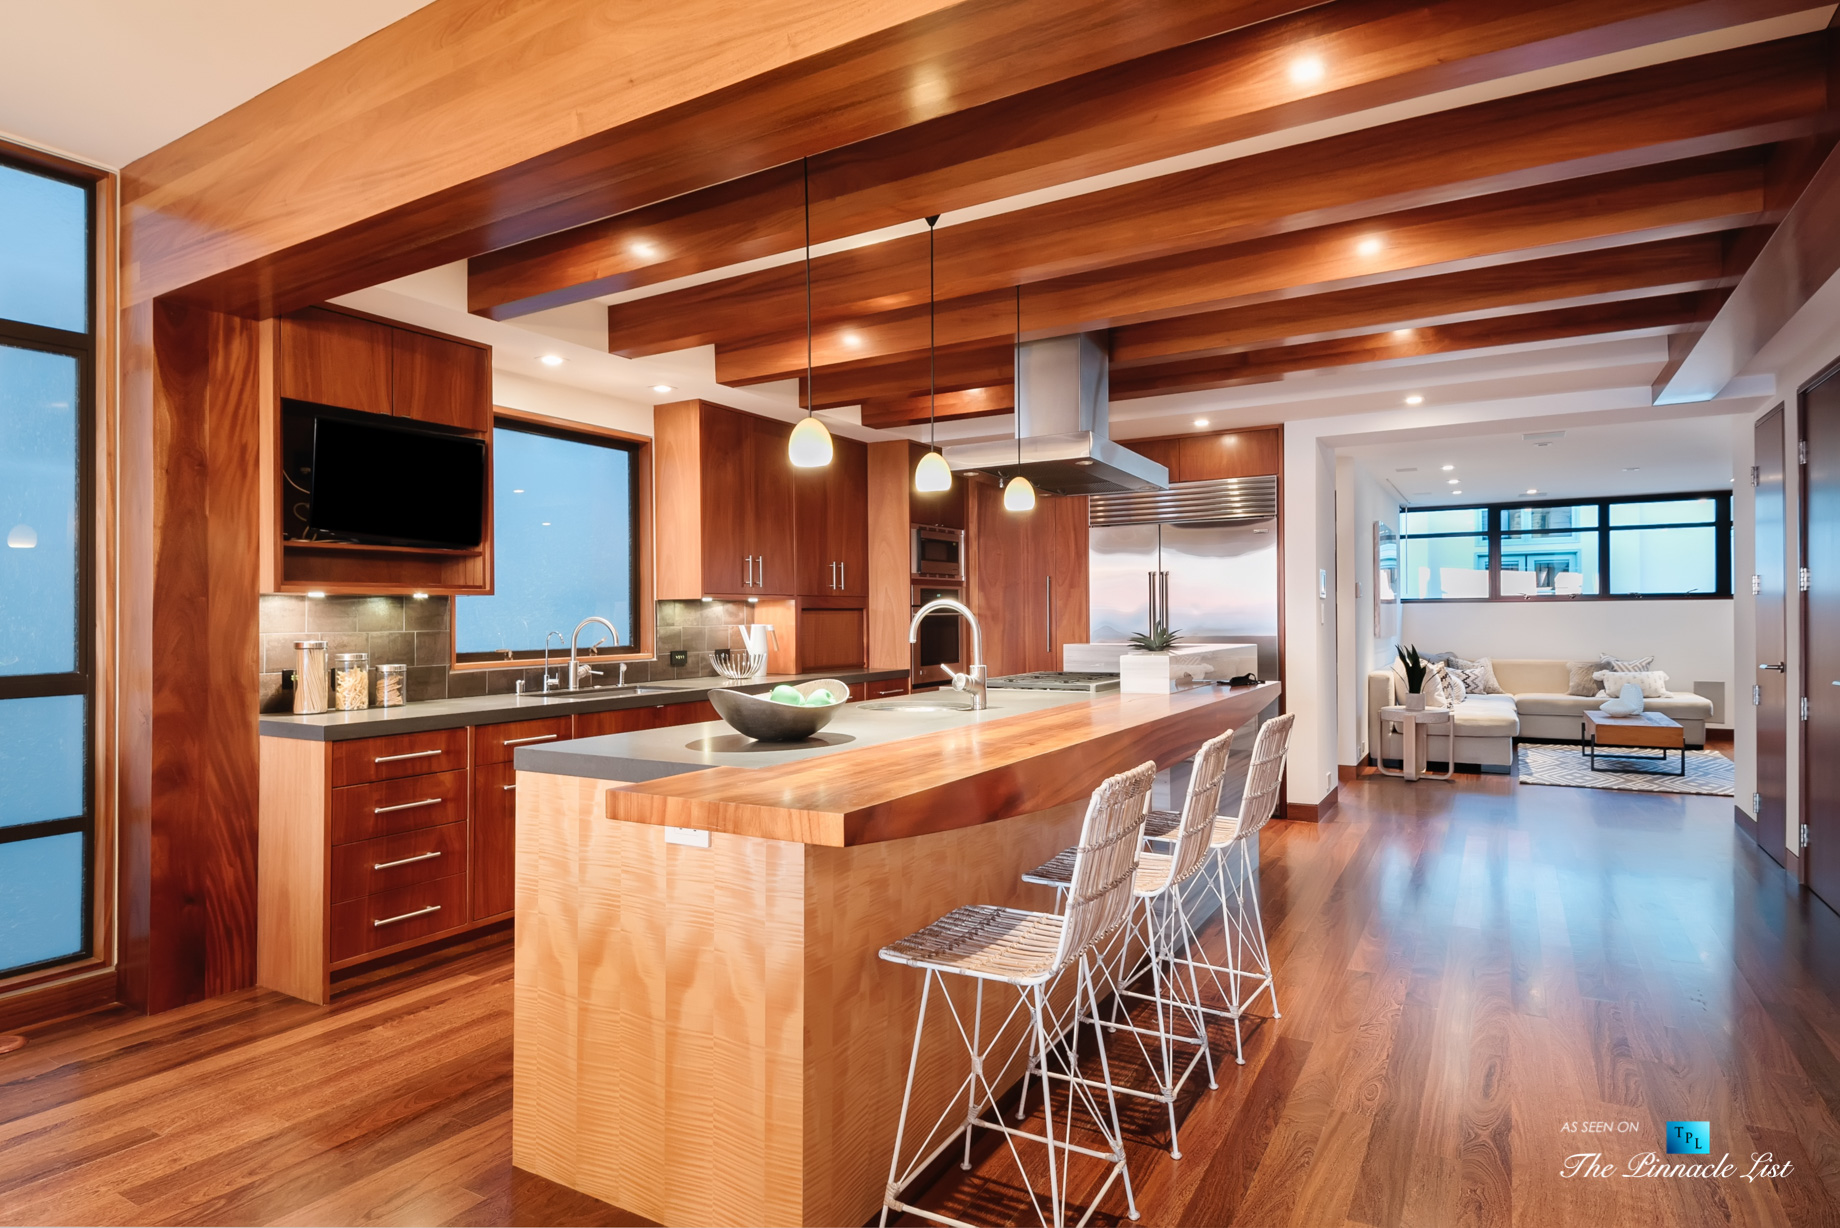 732 The Strand, Hermosa Beach, CA, USA – Kitchen and Family Room